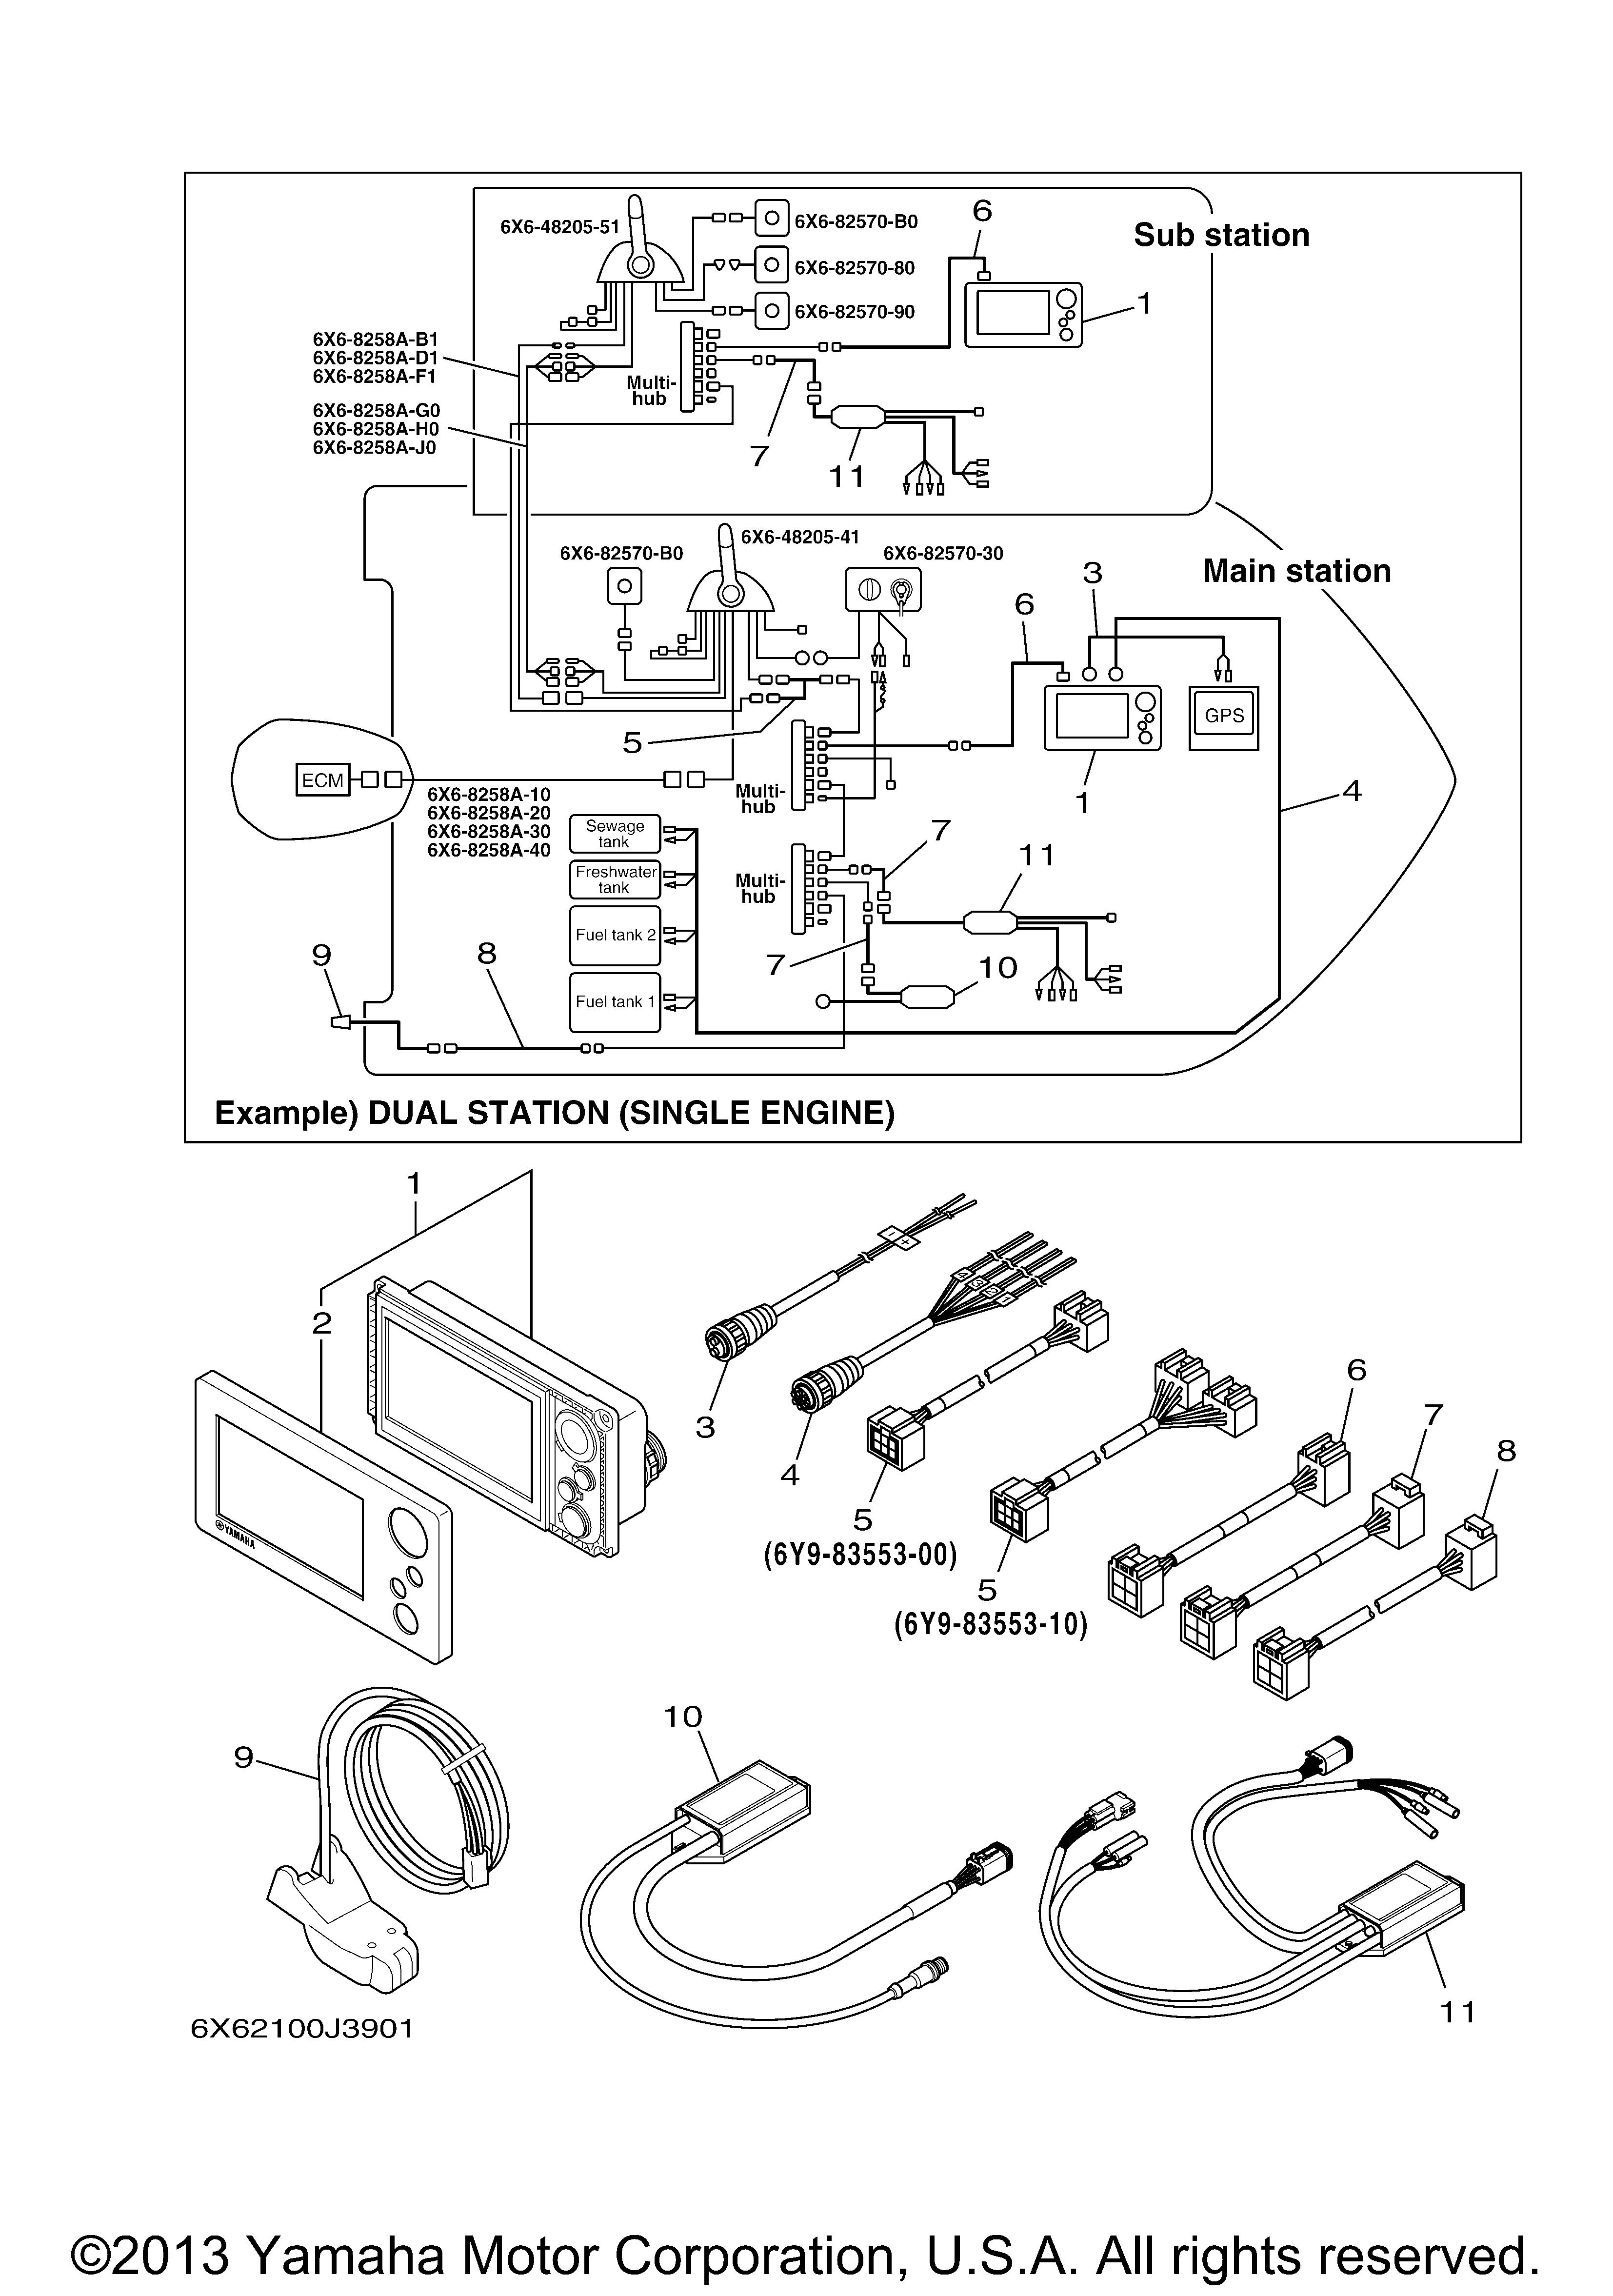 Yamaha Command Link Gauge Wiring Show Diagram Of Power